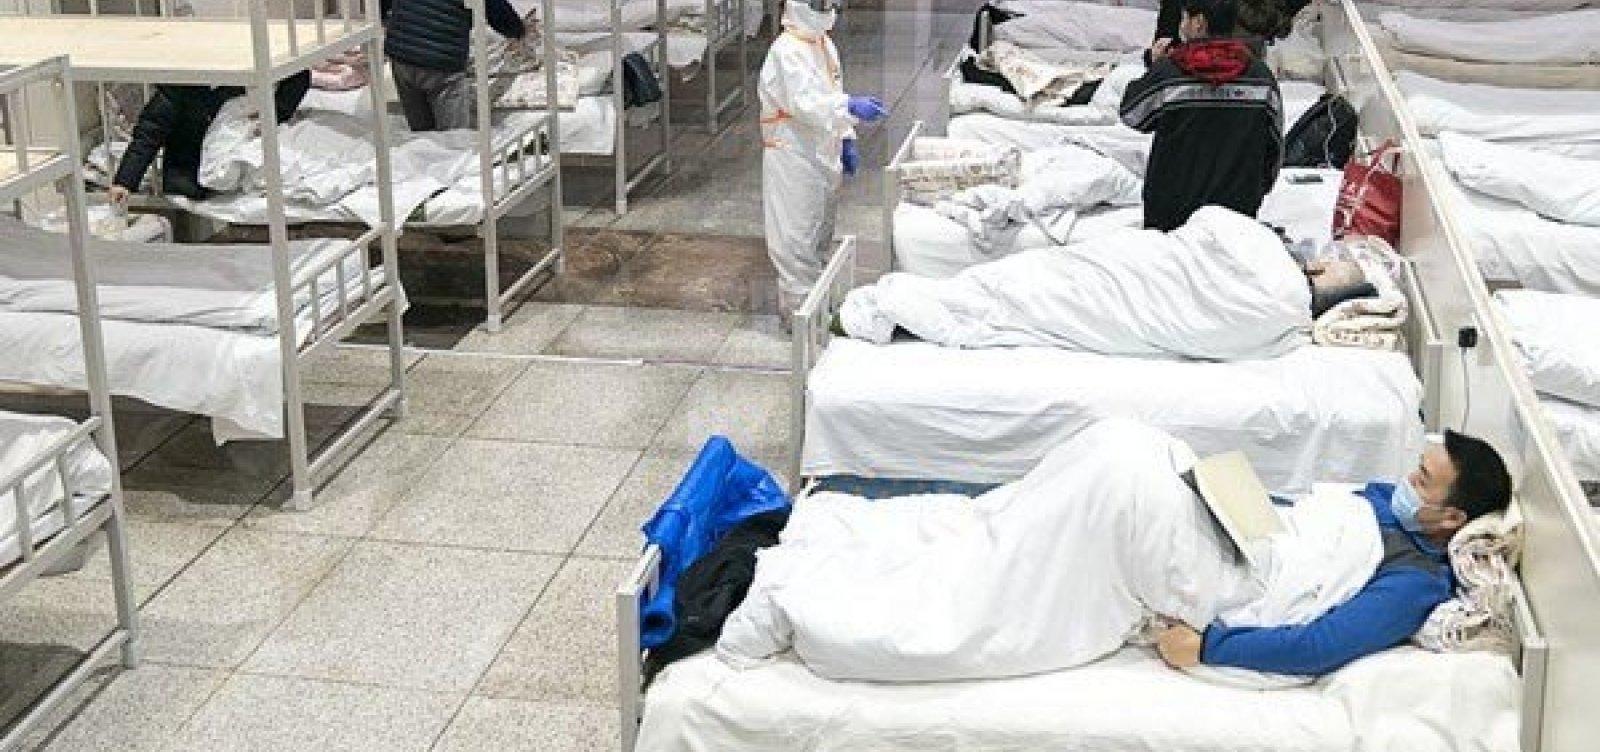 [Brasil tem 11 casos suspeitos de novo coronavírus]